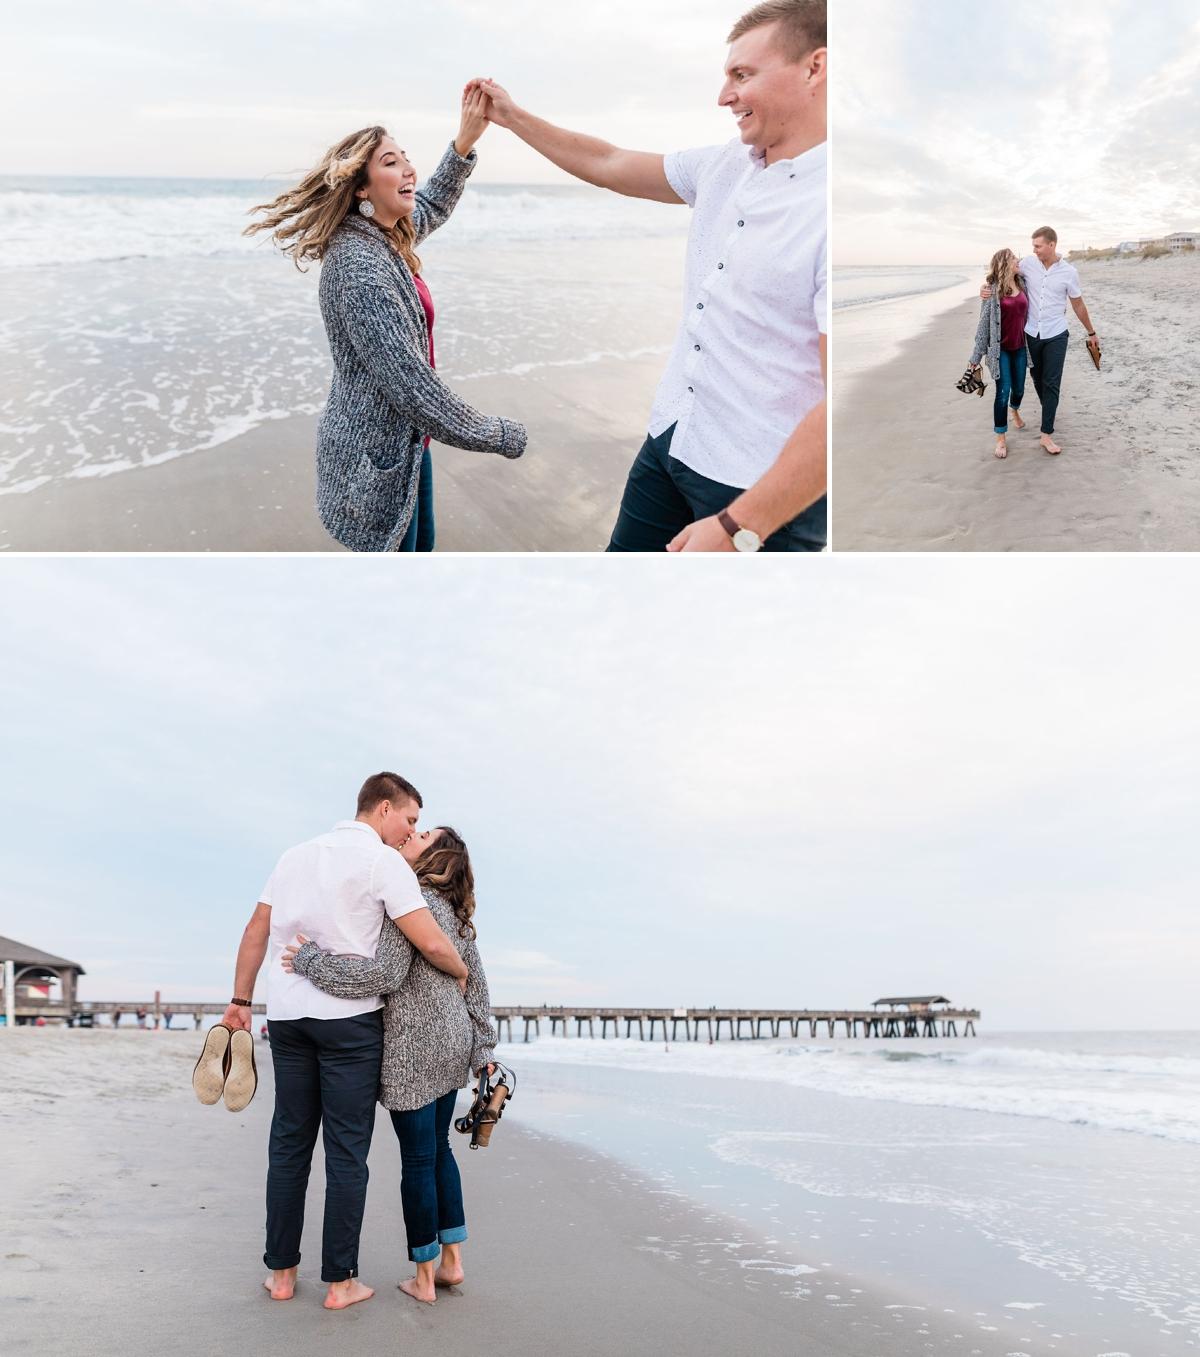 Tybee Island Engagement Session - Savannah Engagement Photographer